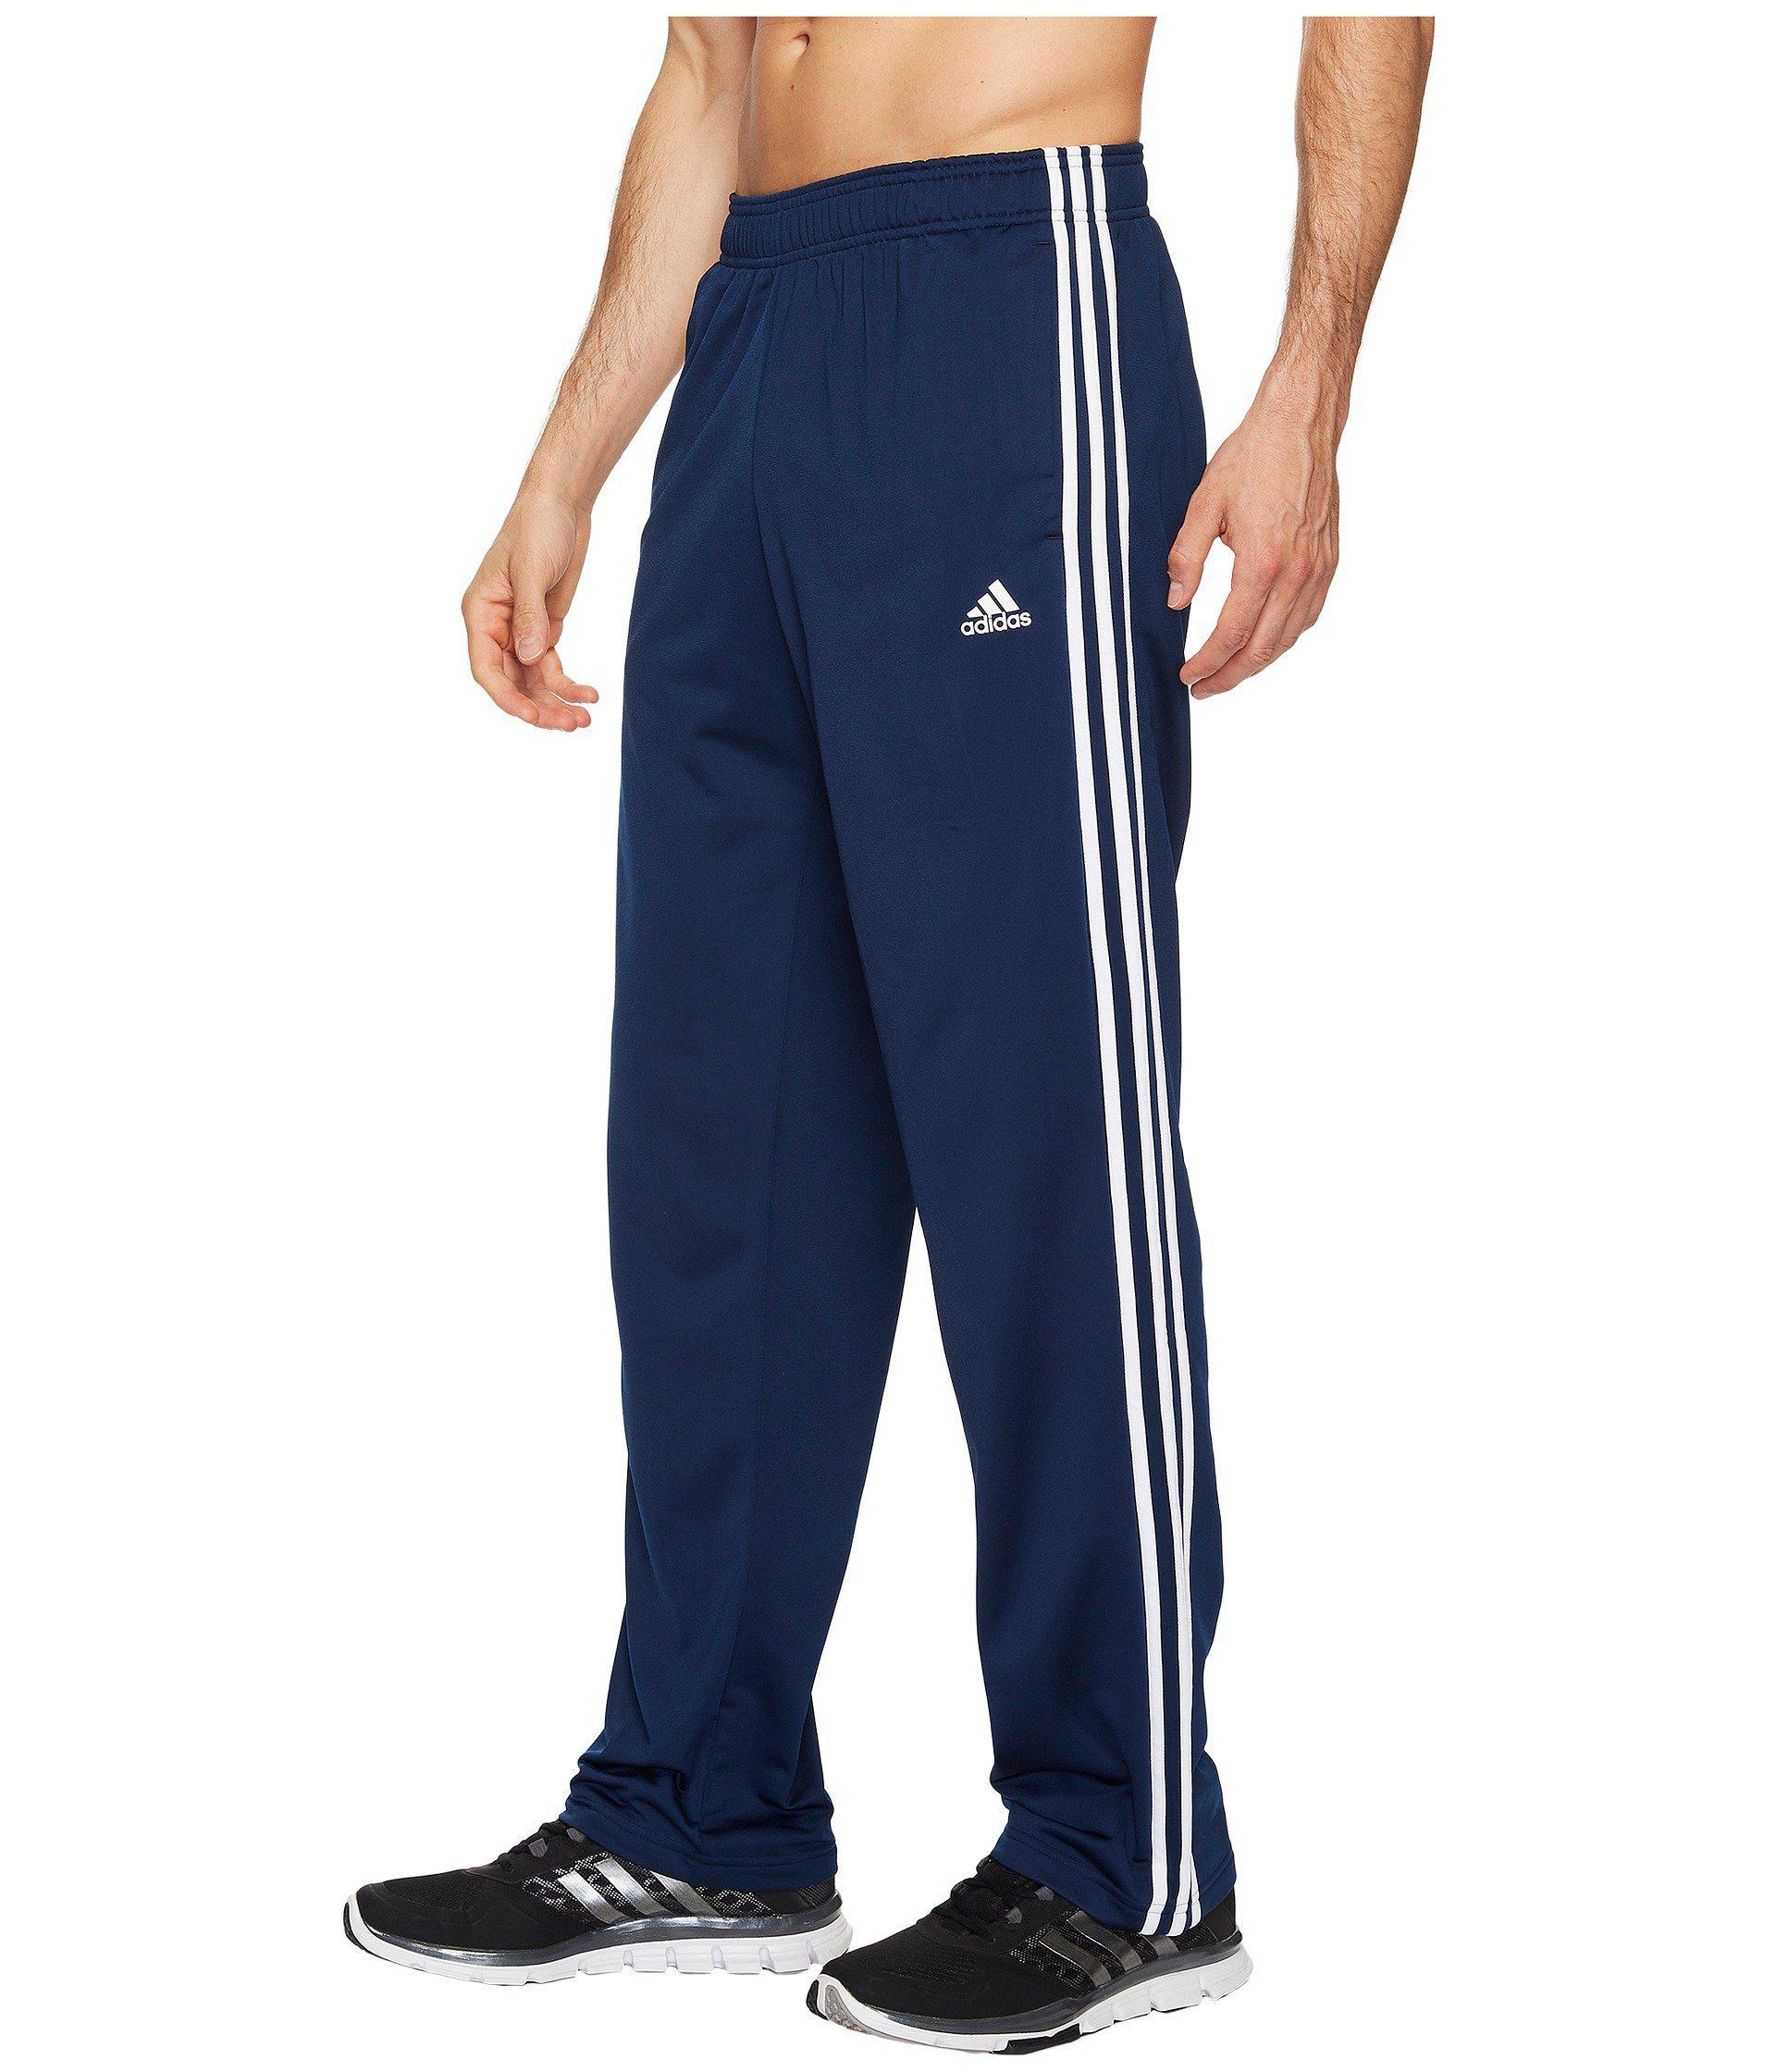 adidas. Men's Blue Essentials 3-stripes Regular Fit Tricot Pants